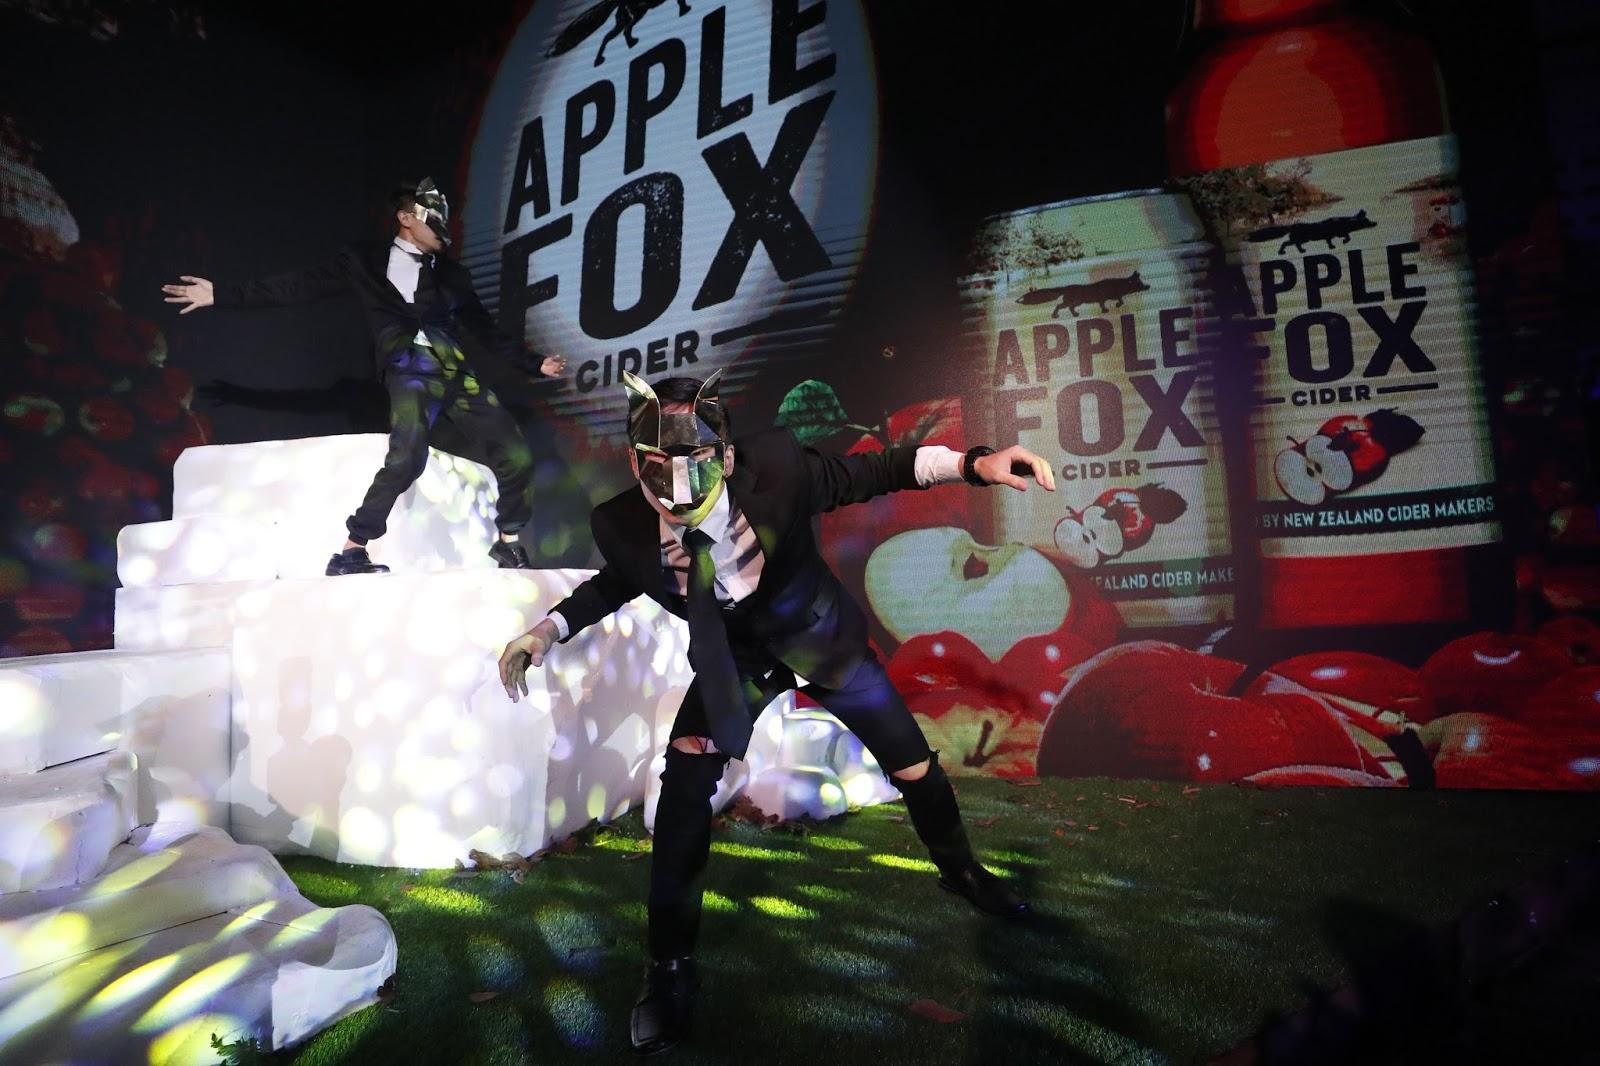 apple fox cider